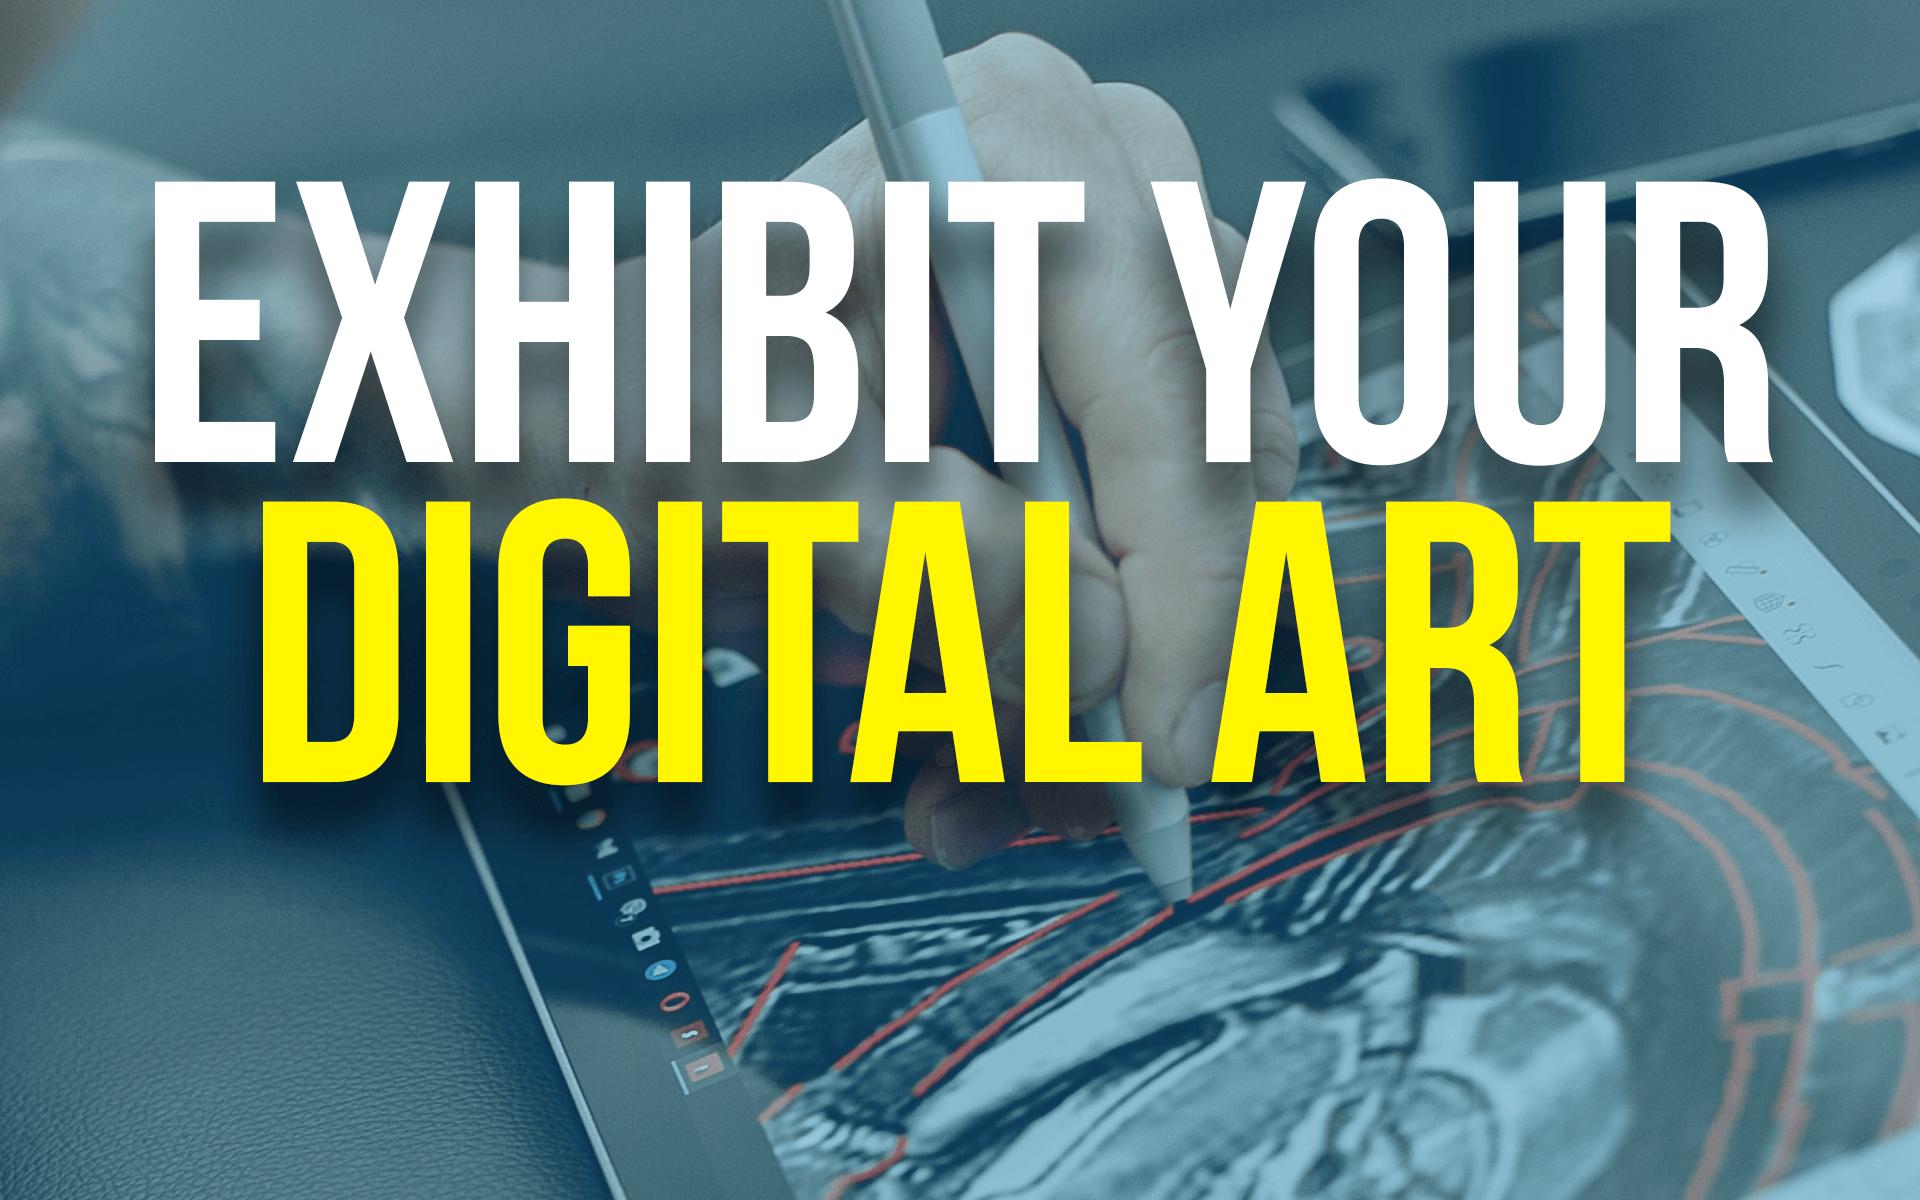 Digital Art SLIDER FOR MOBILE WITH GRID 1920x1200